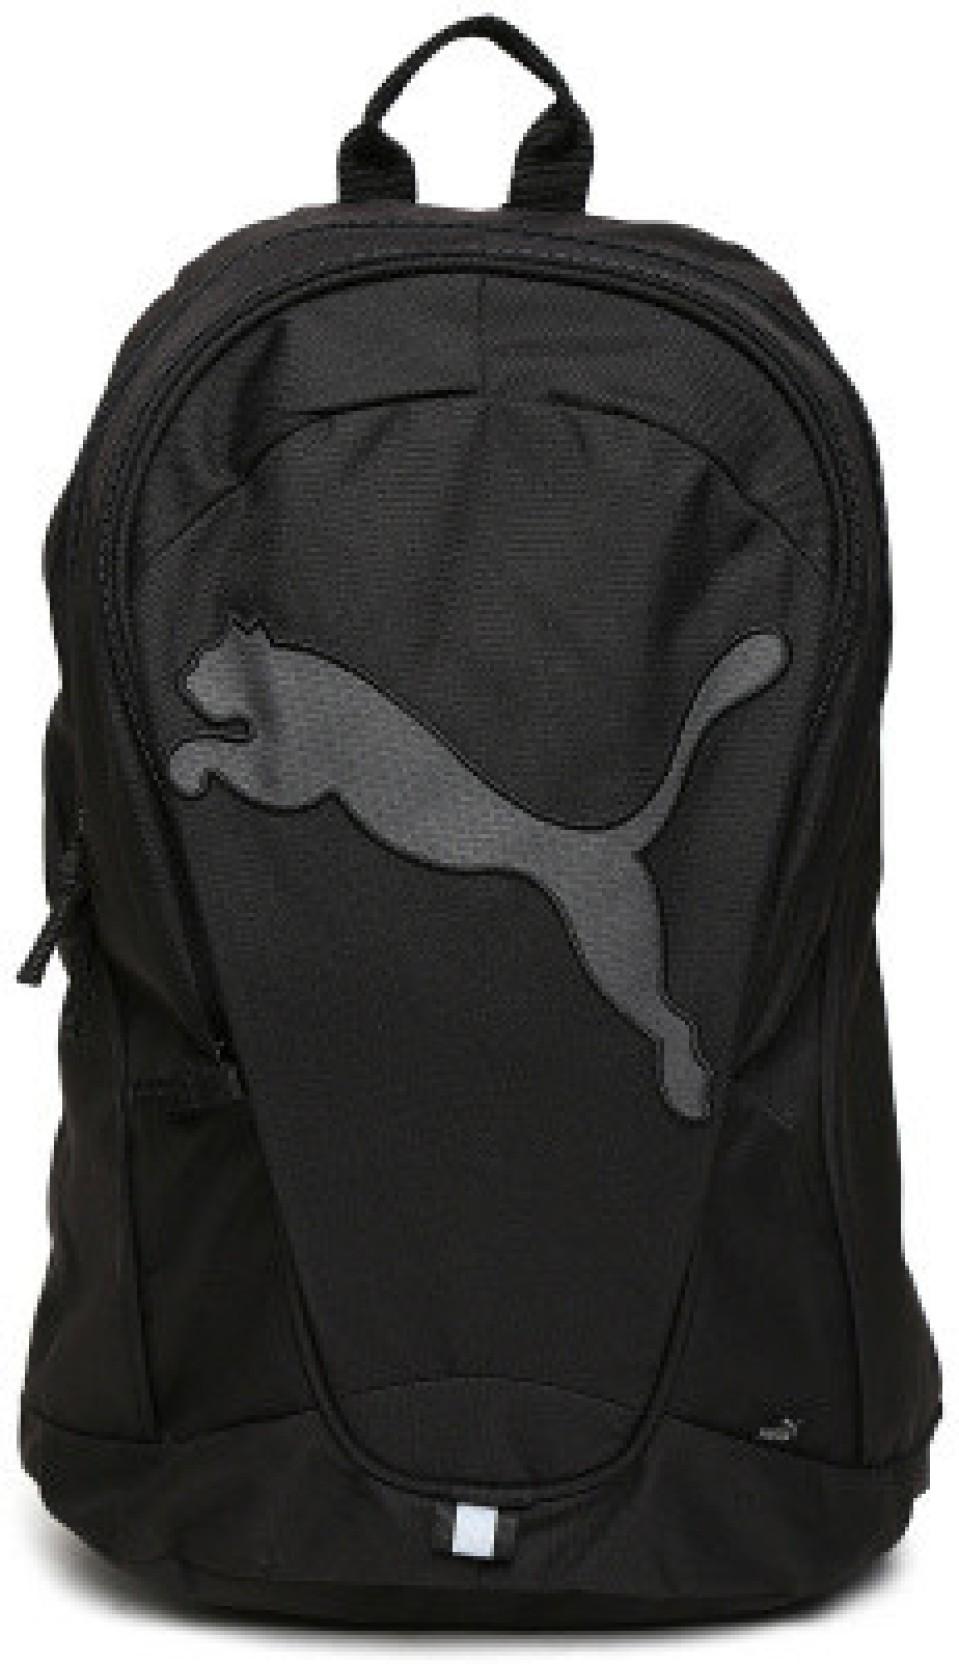 0470143fd2fa Puma 6914101 Medium Backpack Black Dark Shadow - Price in India ...